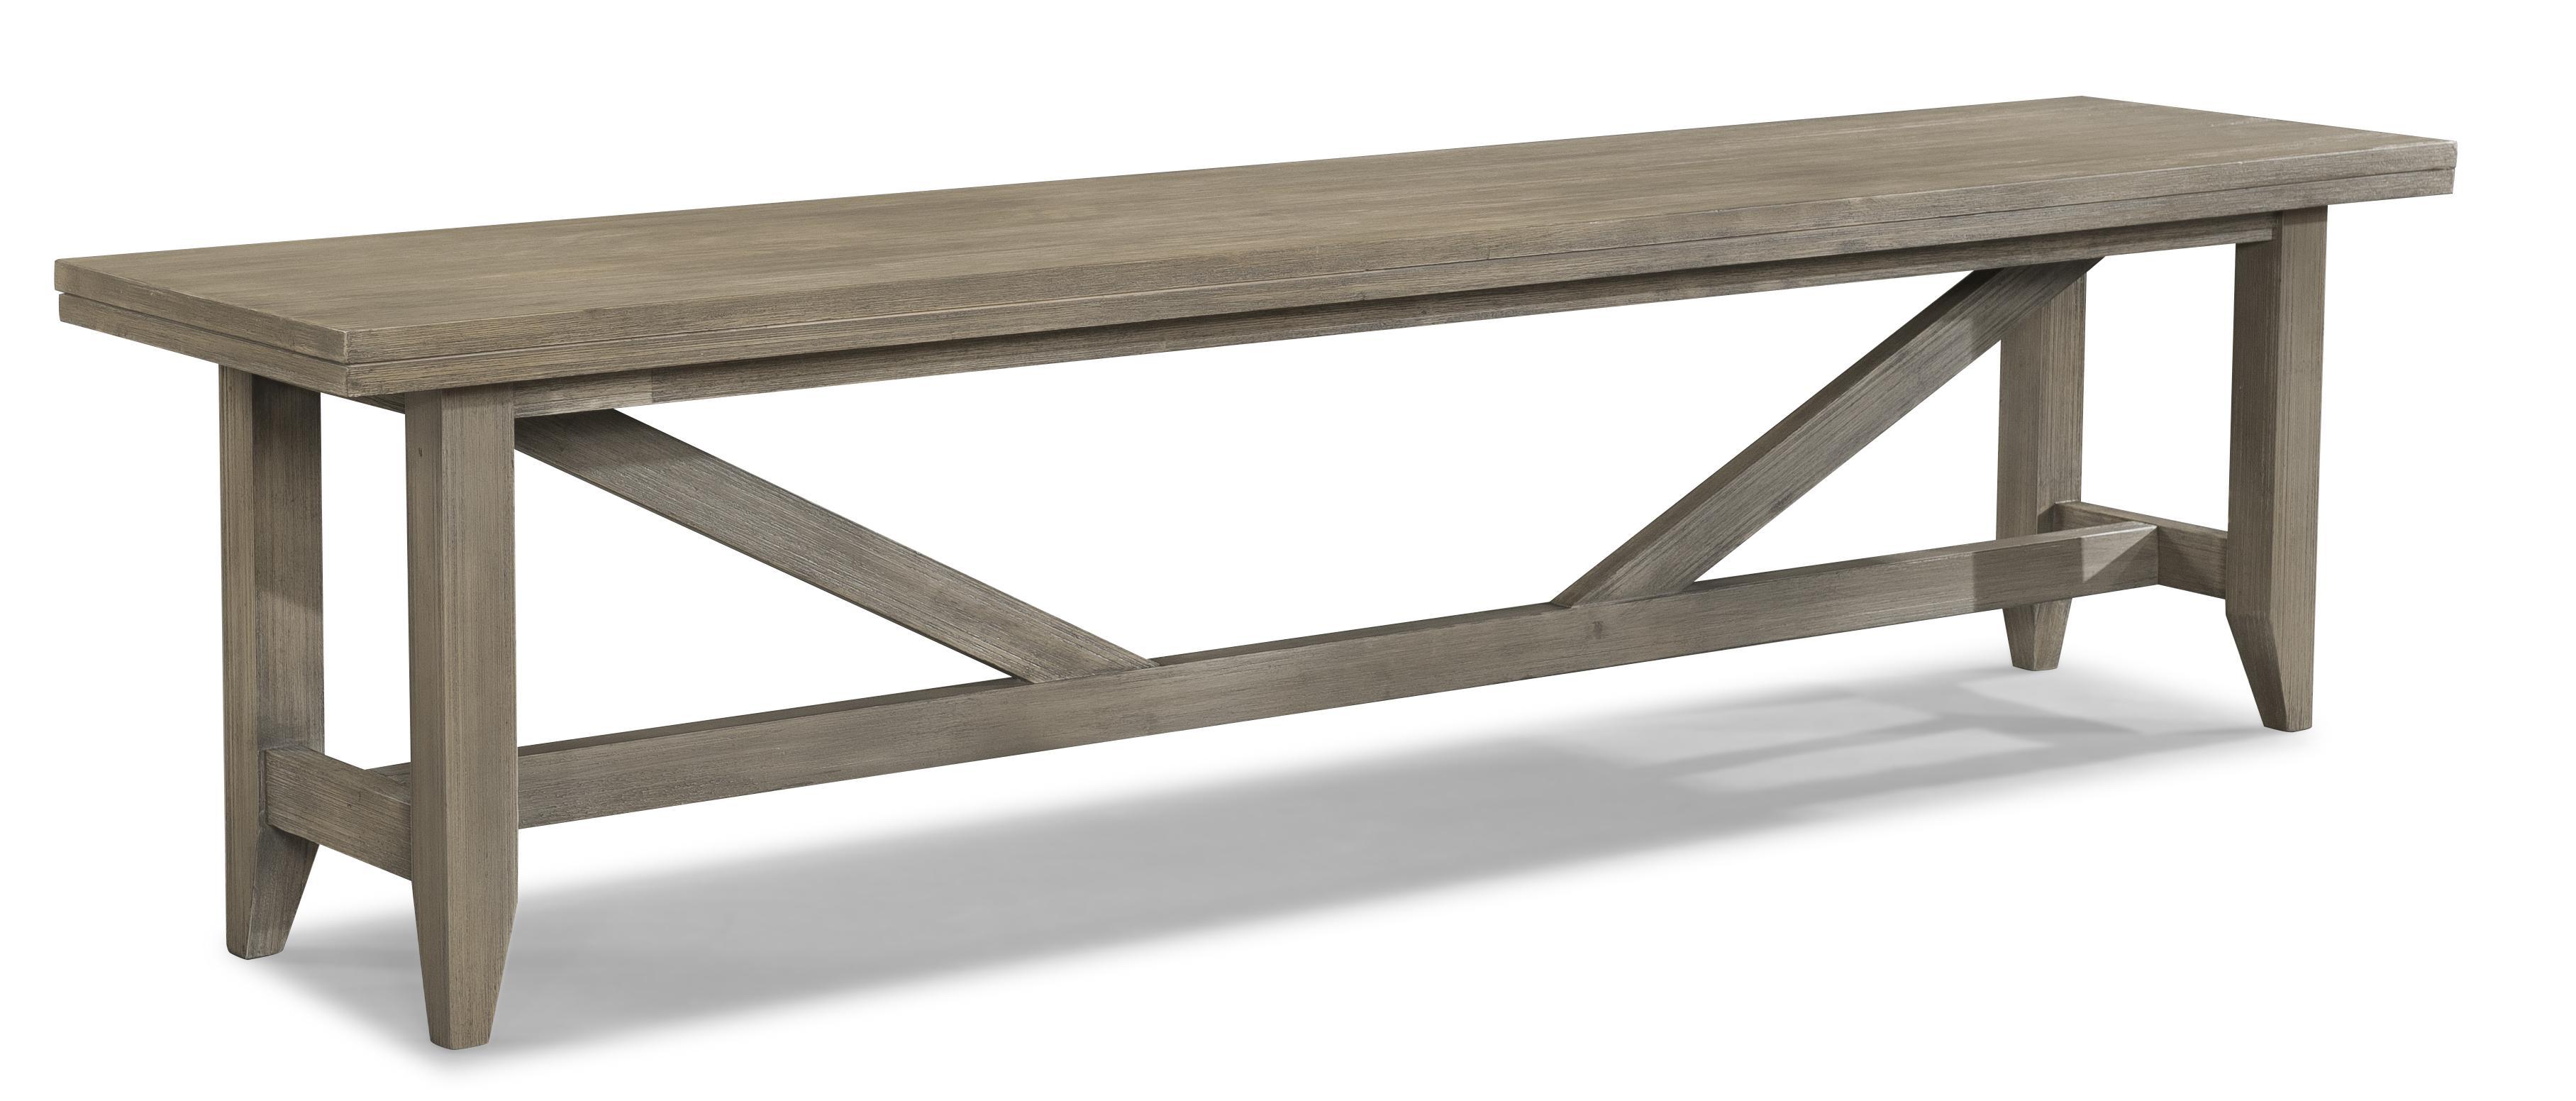 Cresent Fine Furniture Corliss Landing Bench - Item Number: 5659